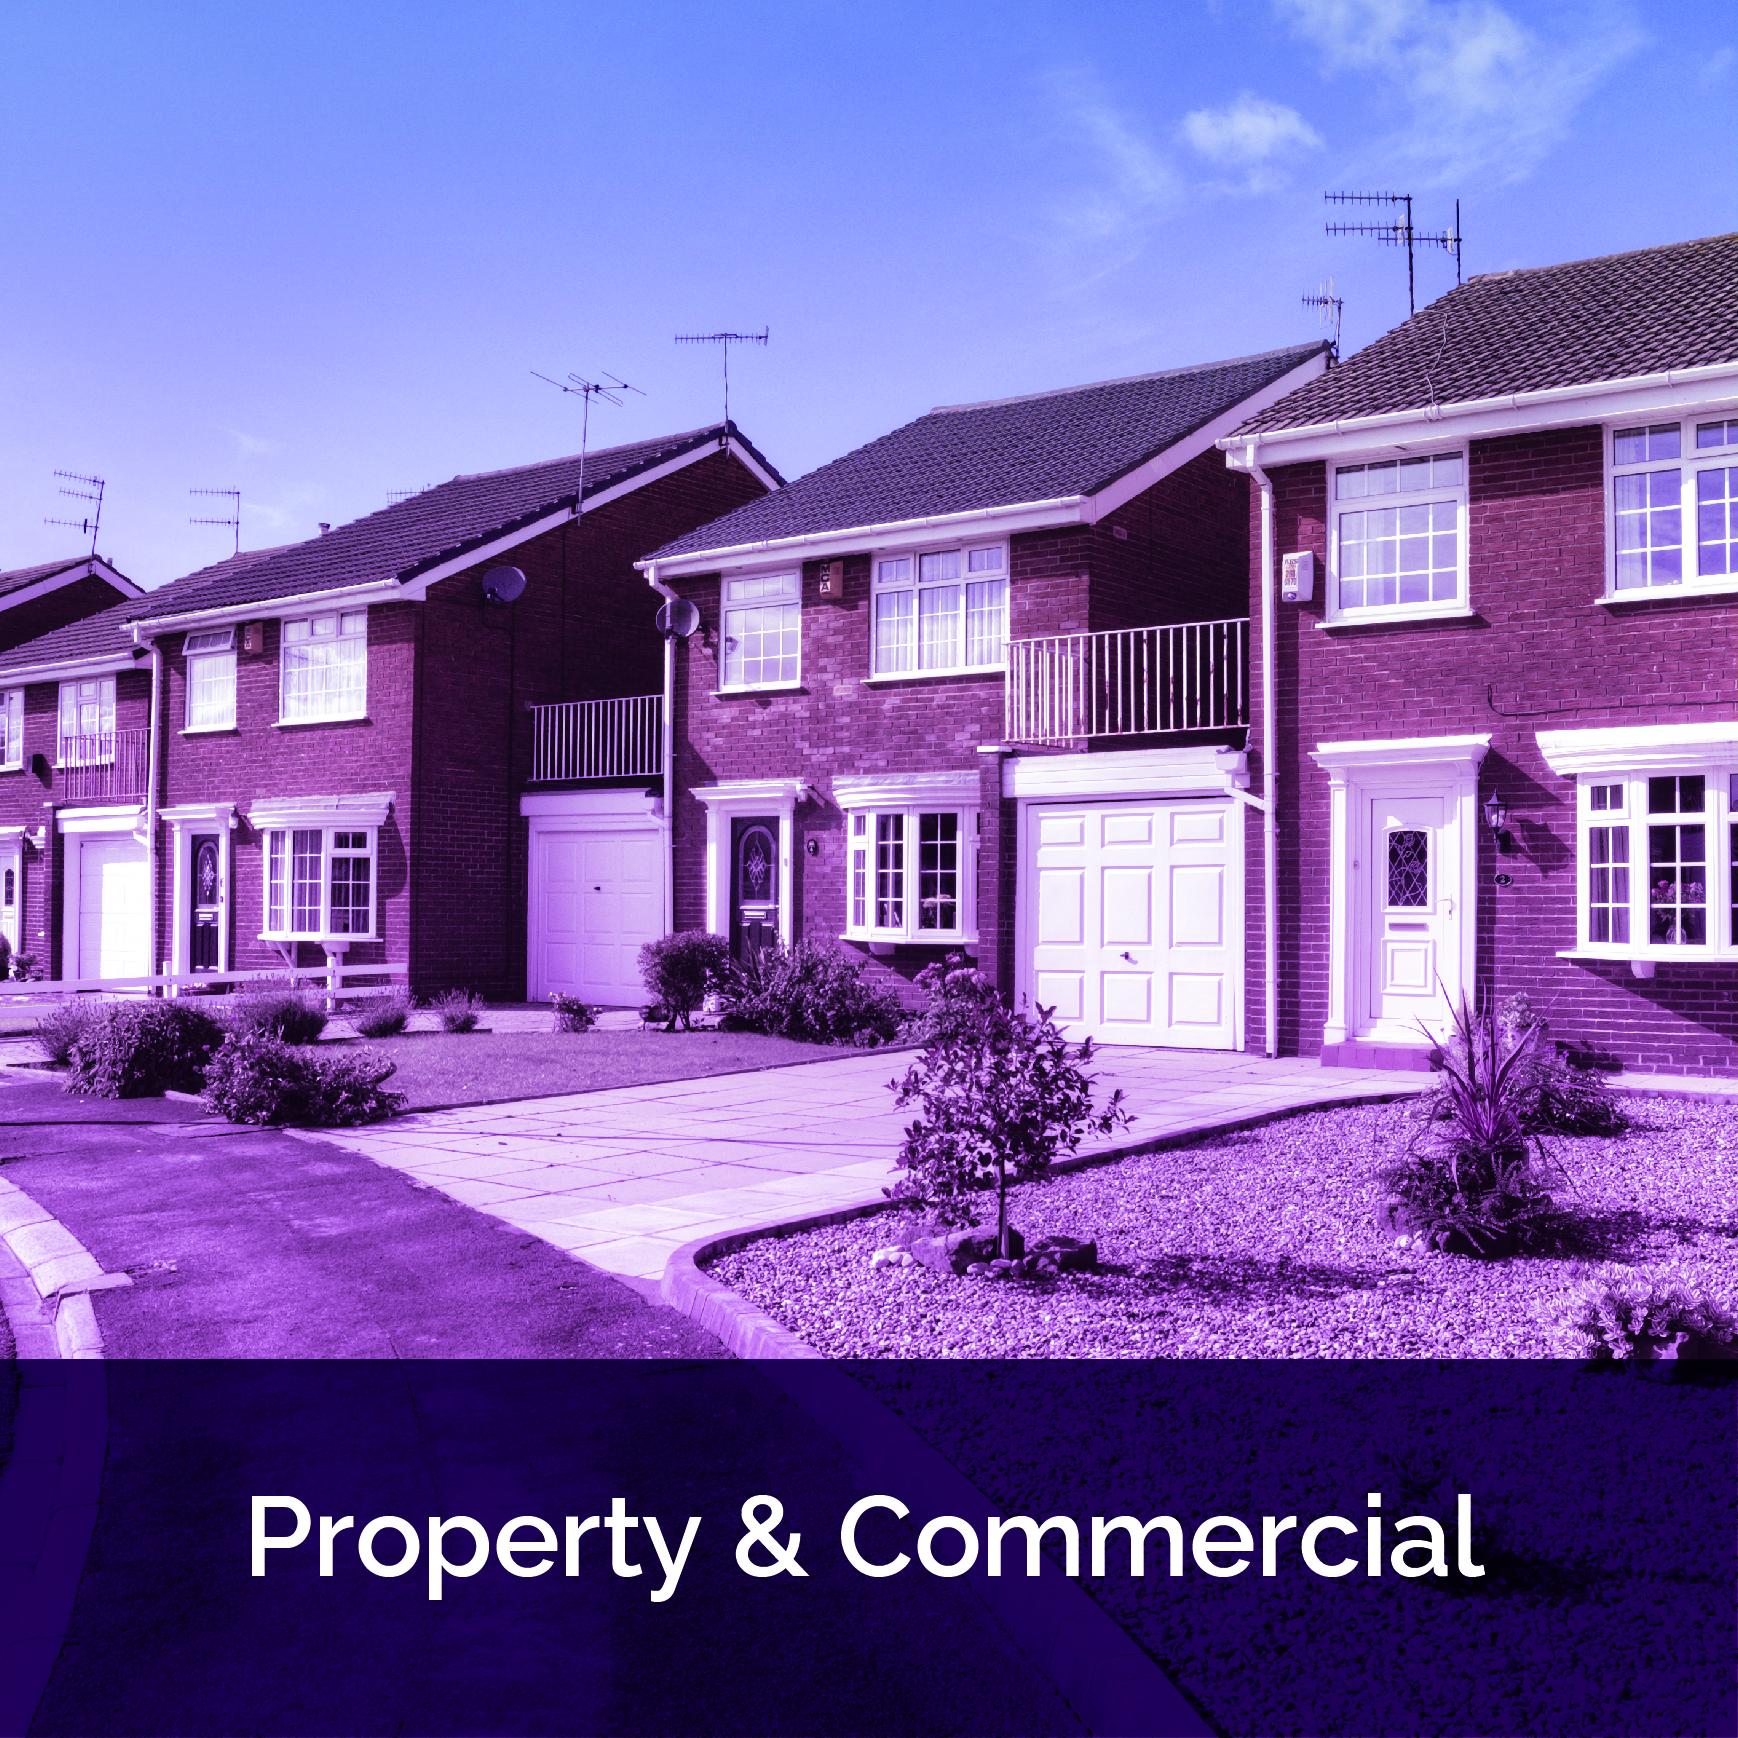 Ascend Property & Commercial